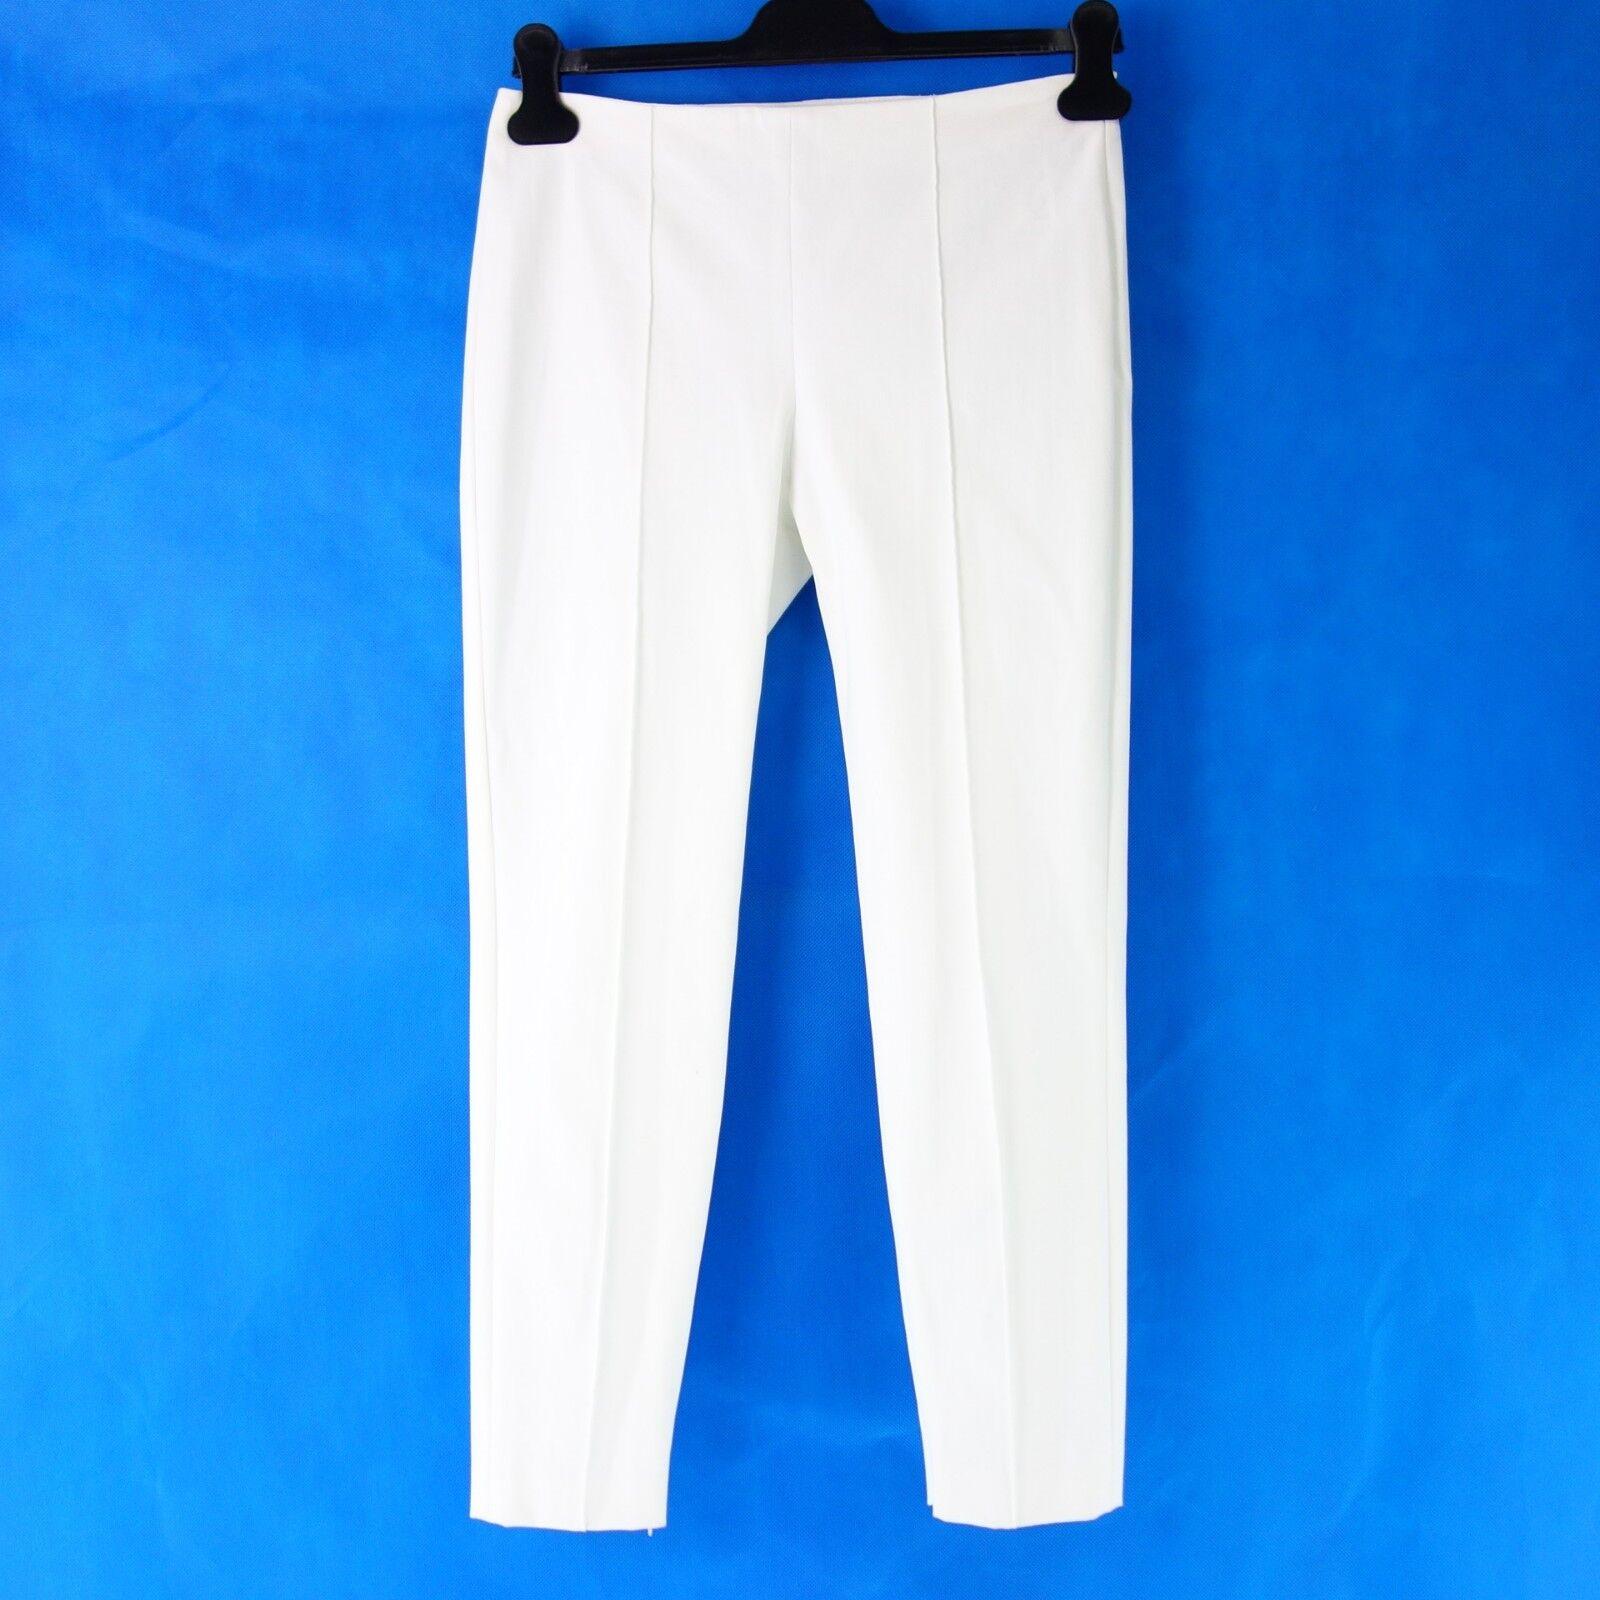 THEORY Damen Hose ALETTAH Gr 2 2 2 34 Weiß Skinny Stoffhose Business NP 295 NEU    Zu verkaufen    2019    Günstige Preise  01e589